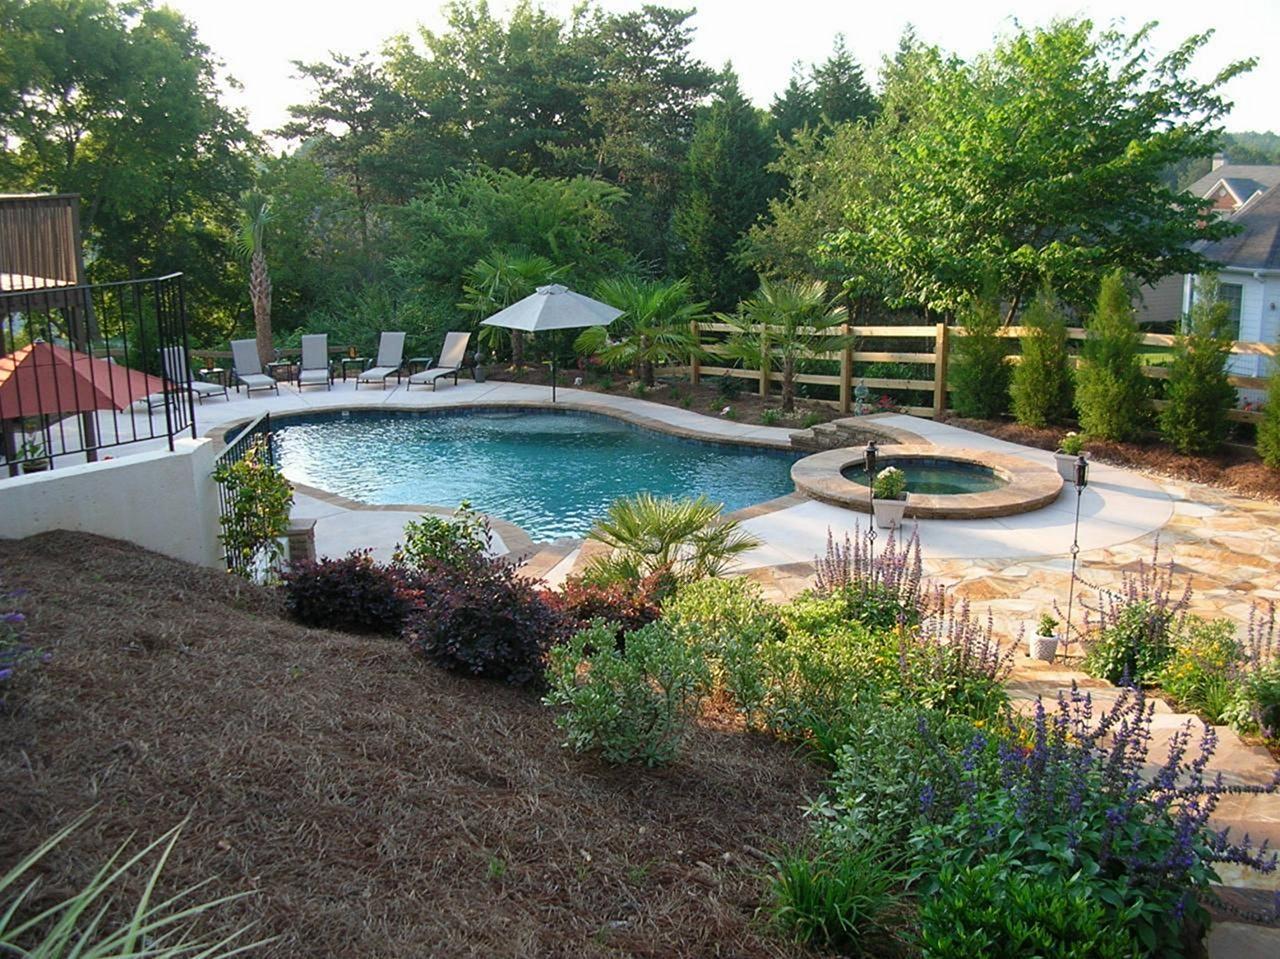 Big Backyard Pool Landscaping Ideas (Big Backyard Pool ... on Backyard Pool And Landscaping Ideas id=49682